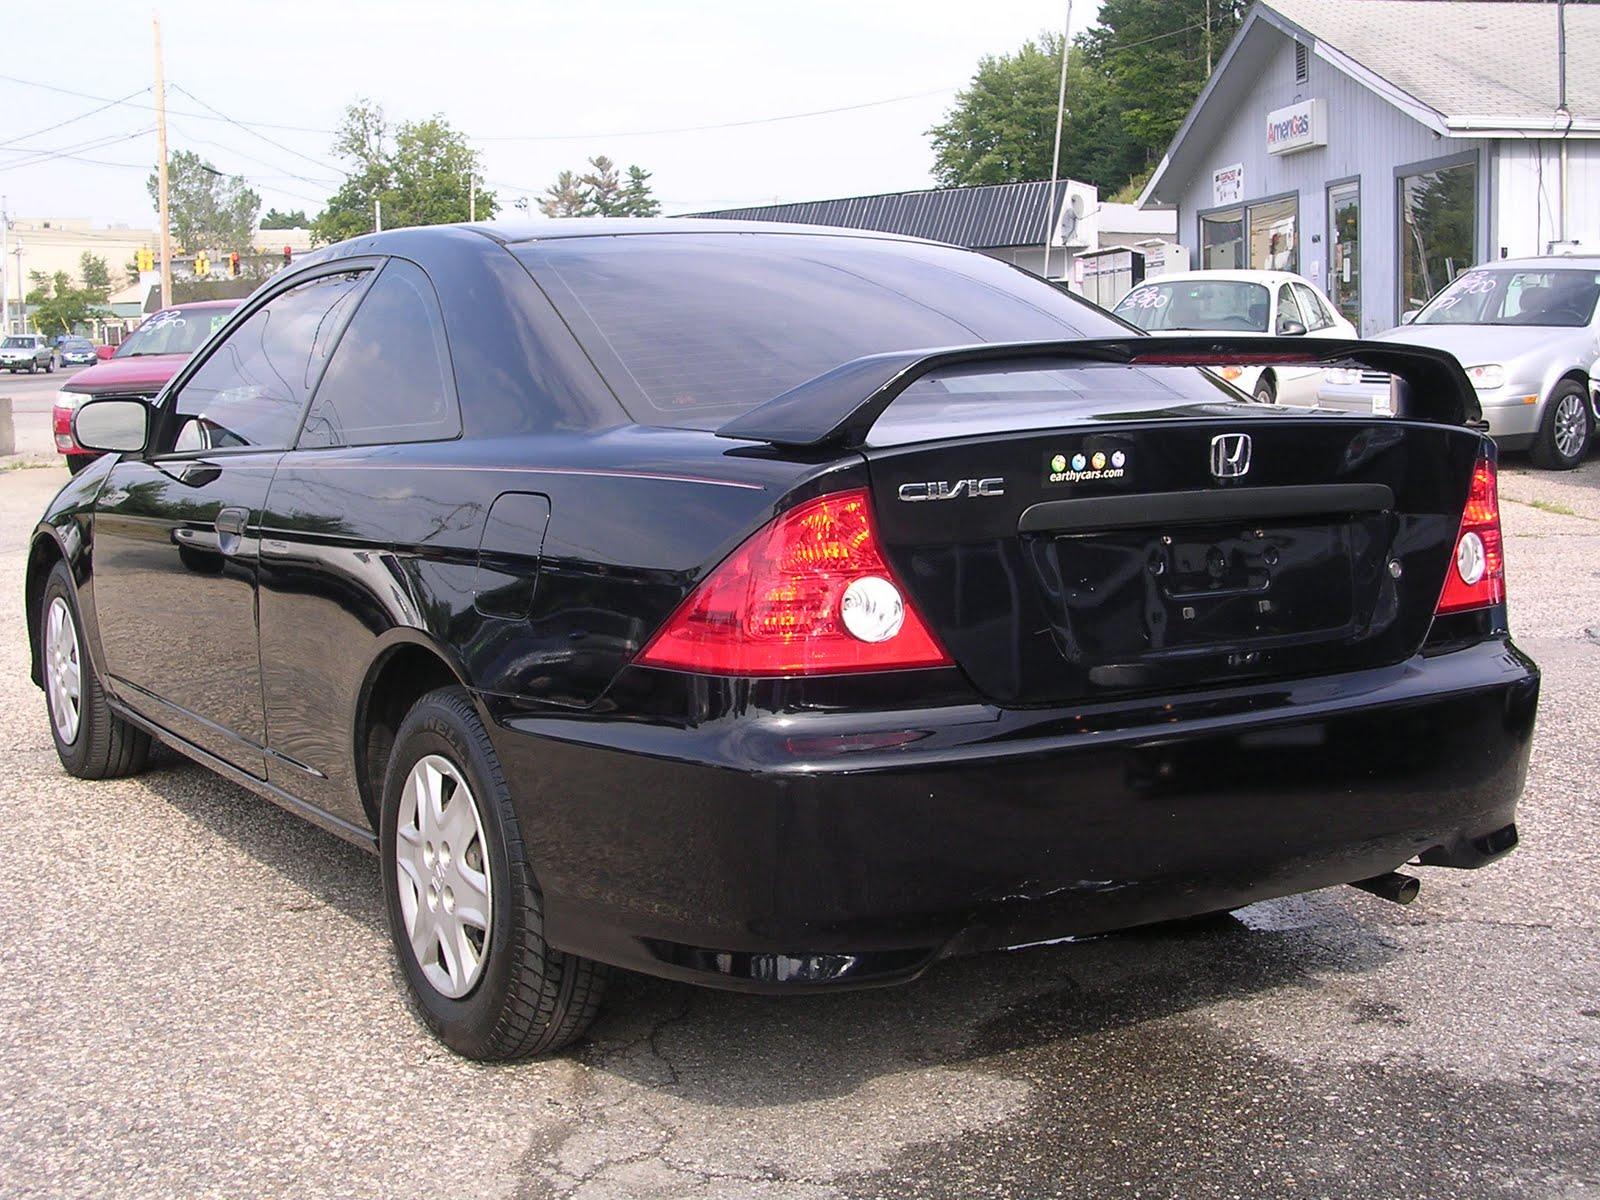 High Quality Yahoo! Autos: Http://autos.yahoo.com/honda/civic Coupe/2005/vp 5 Spd Mt/